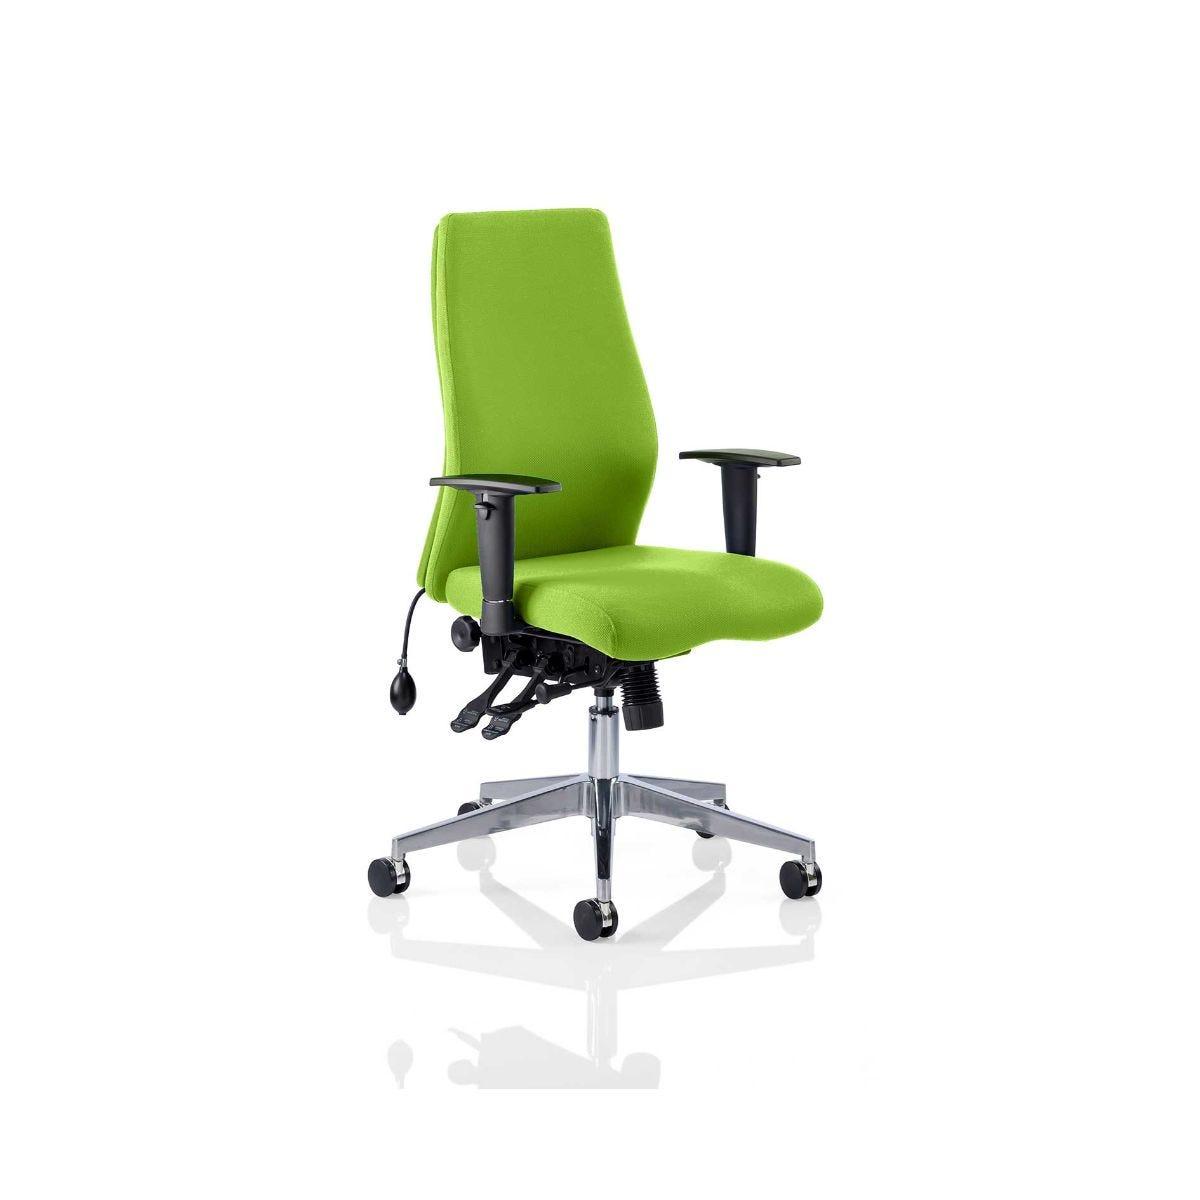 Onyx Bespoke Office Chair, Myrhh